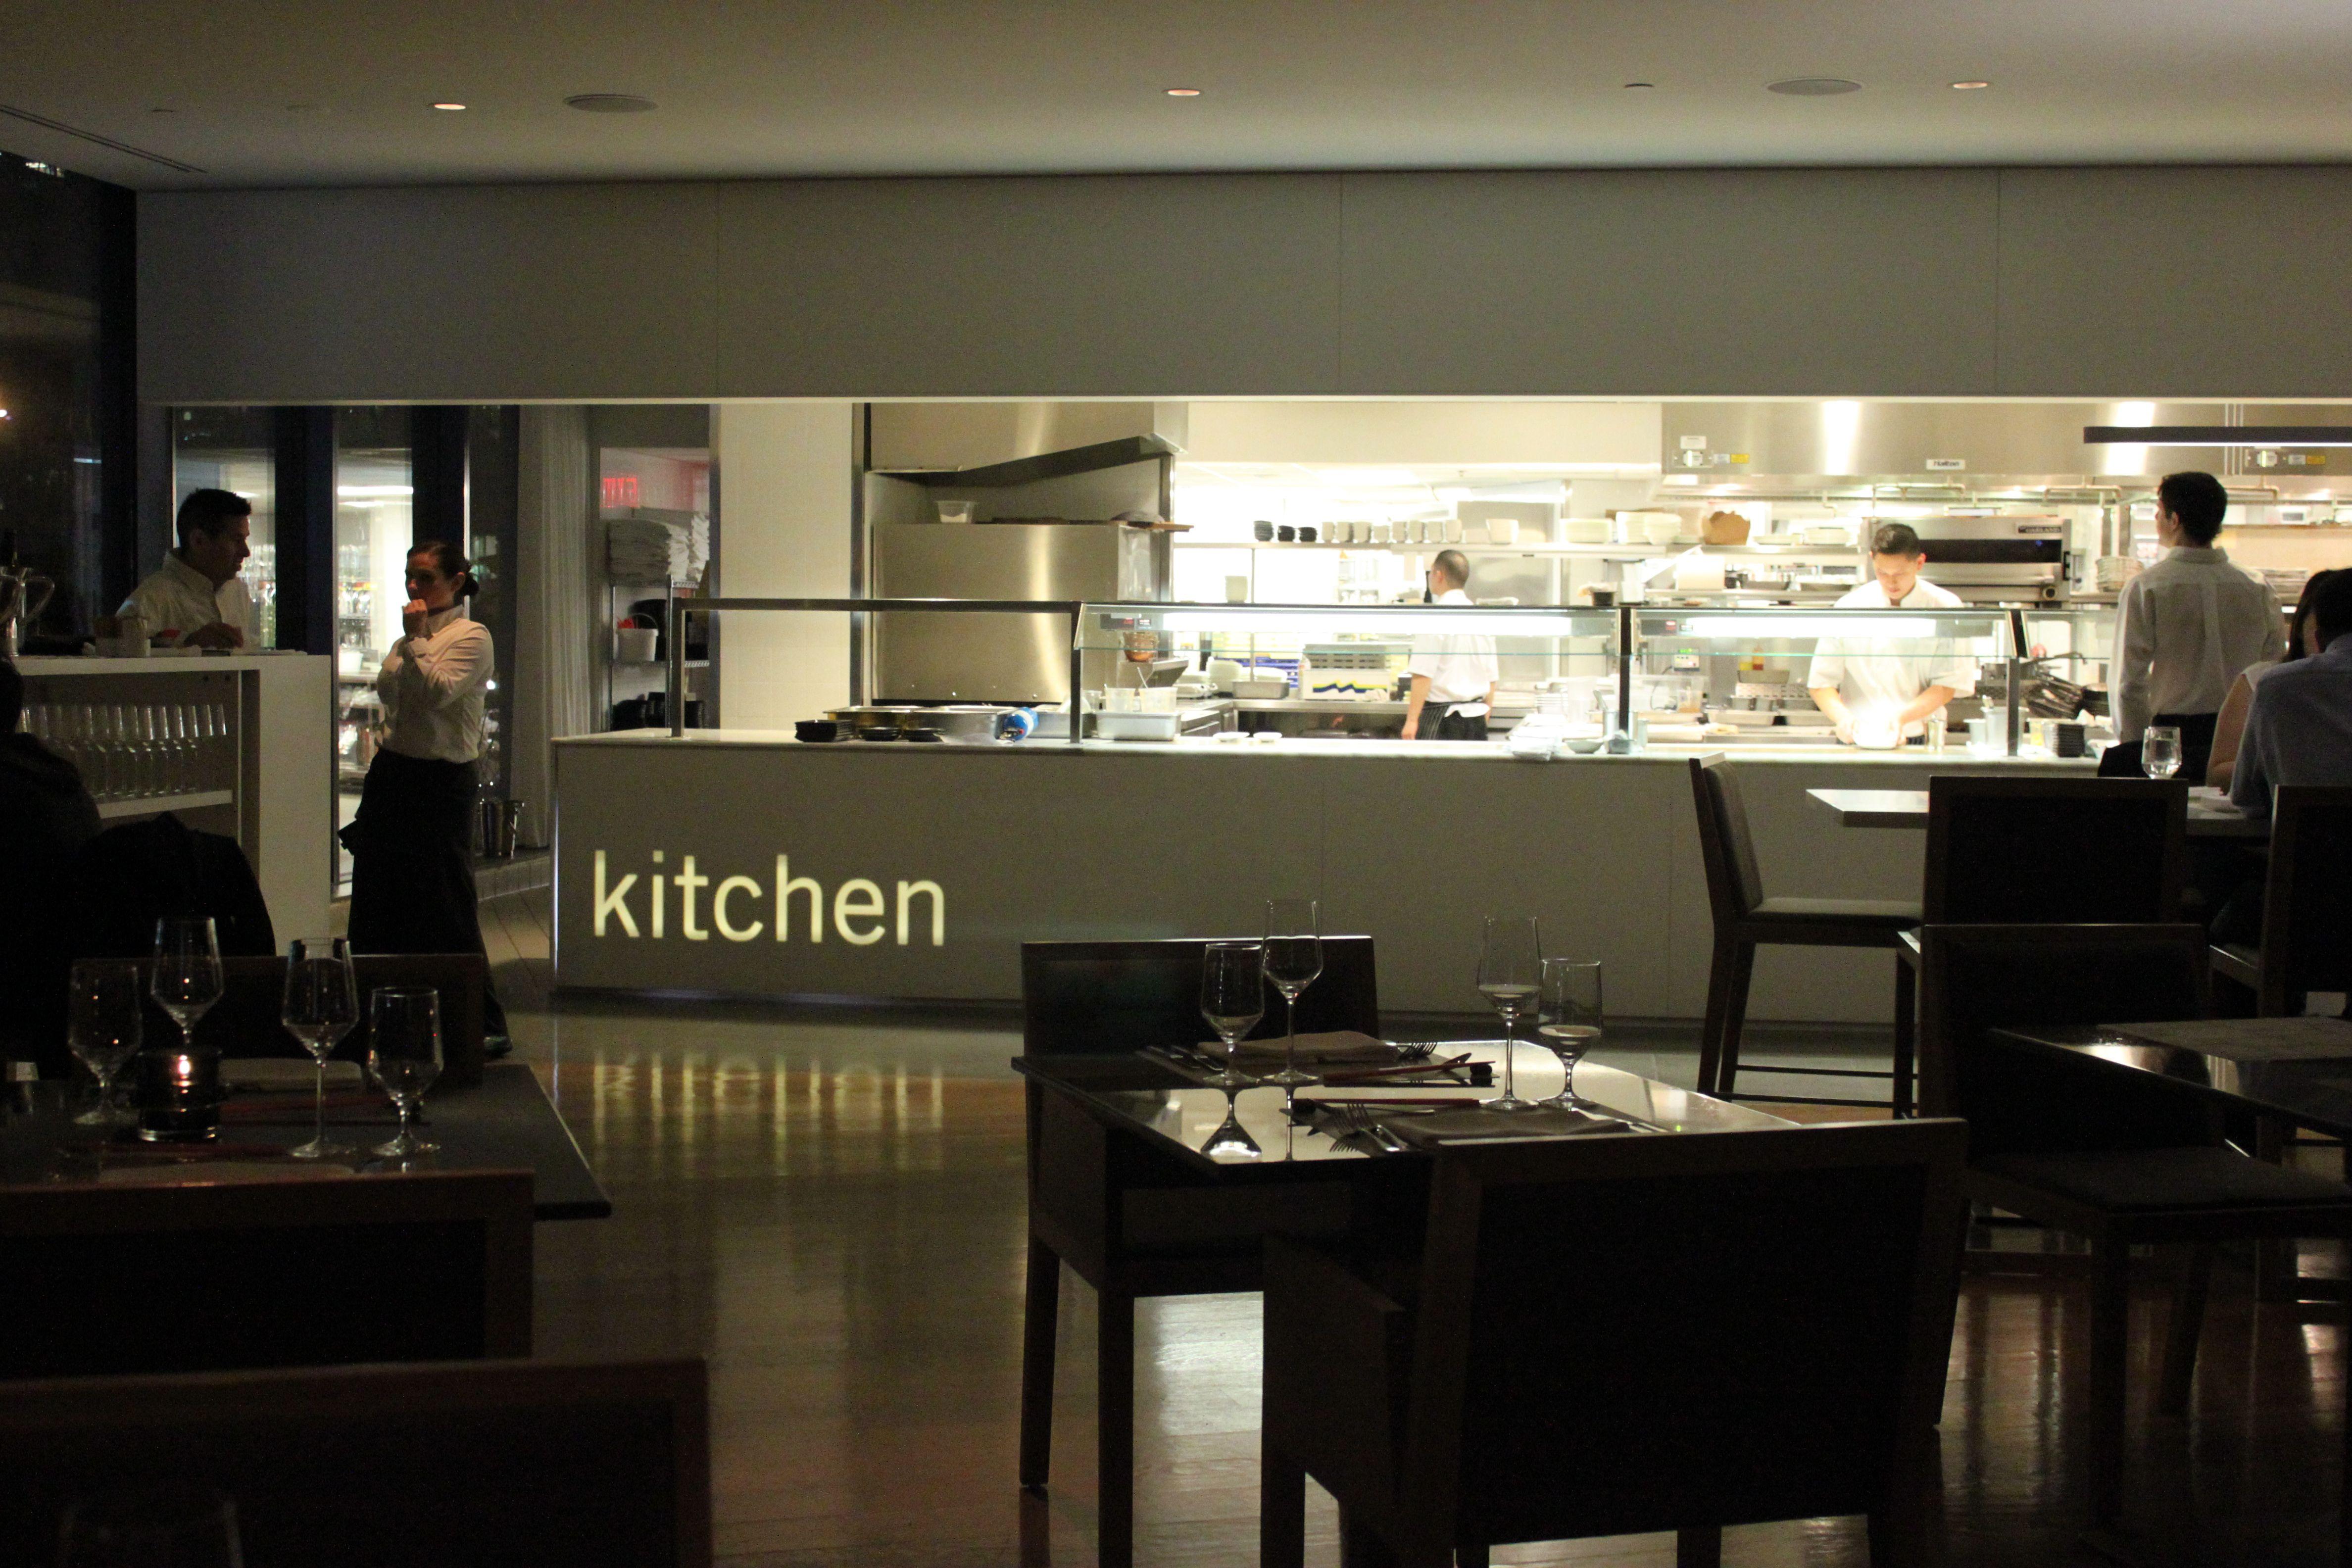 commercial kitchen lighting appliance sets euorpean restaurant design concept